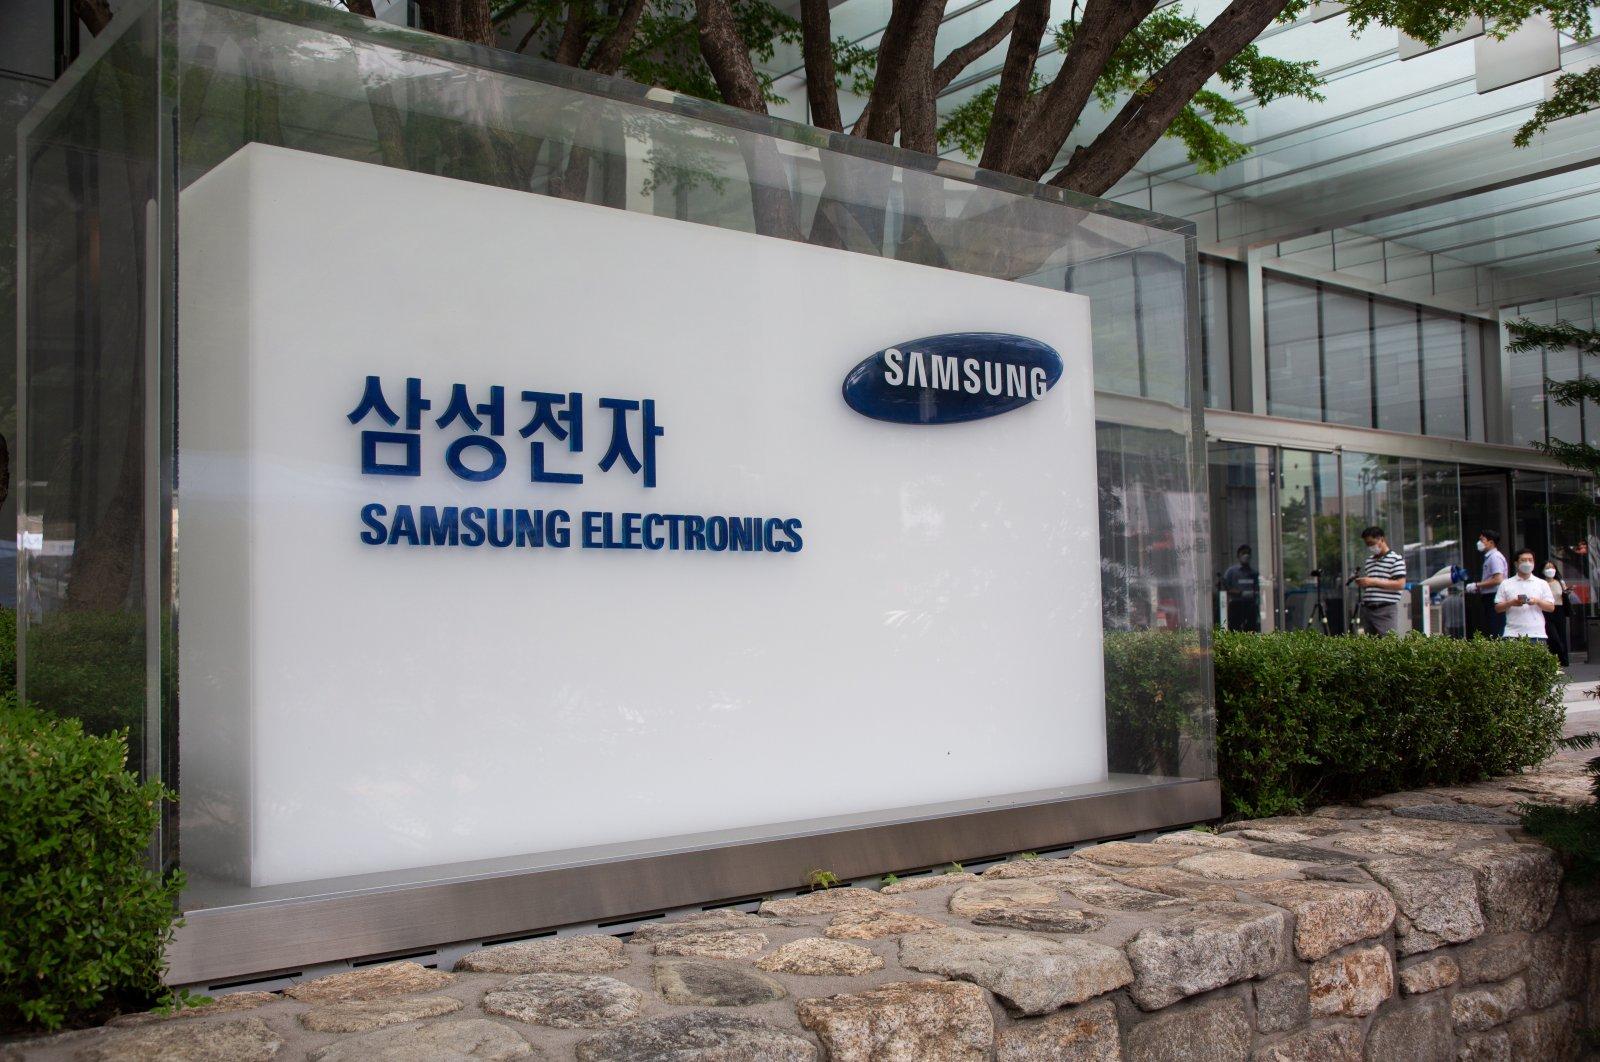 People walk outside the Samsung Electronics headquarters in Seoul, South Korea, July 7, 2021. (EPA Photo)